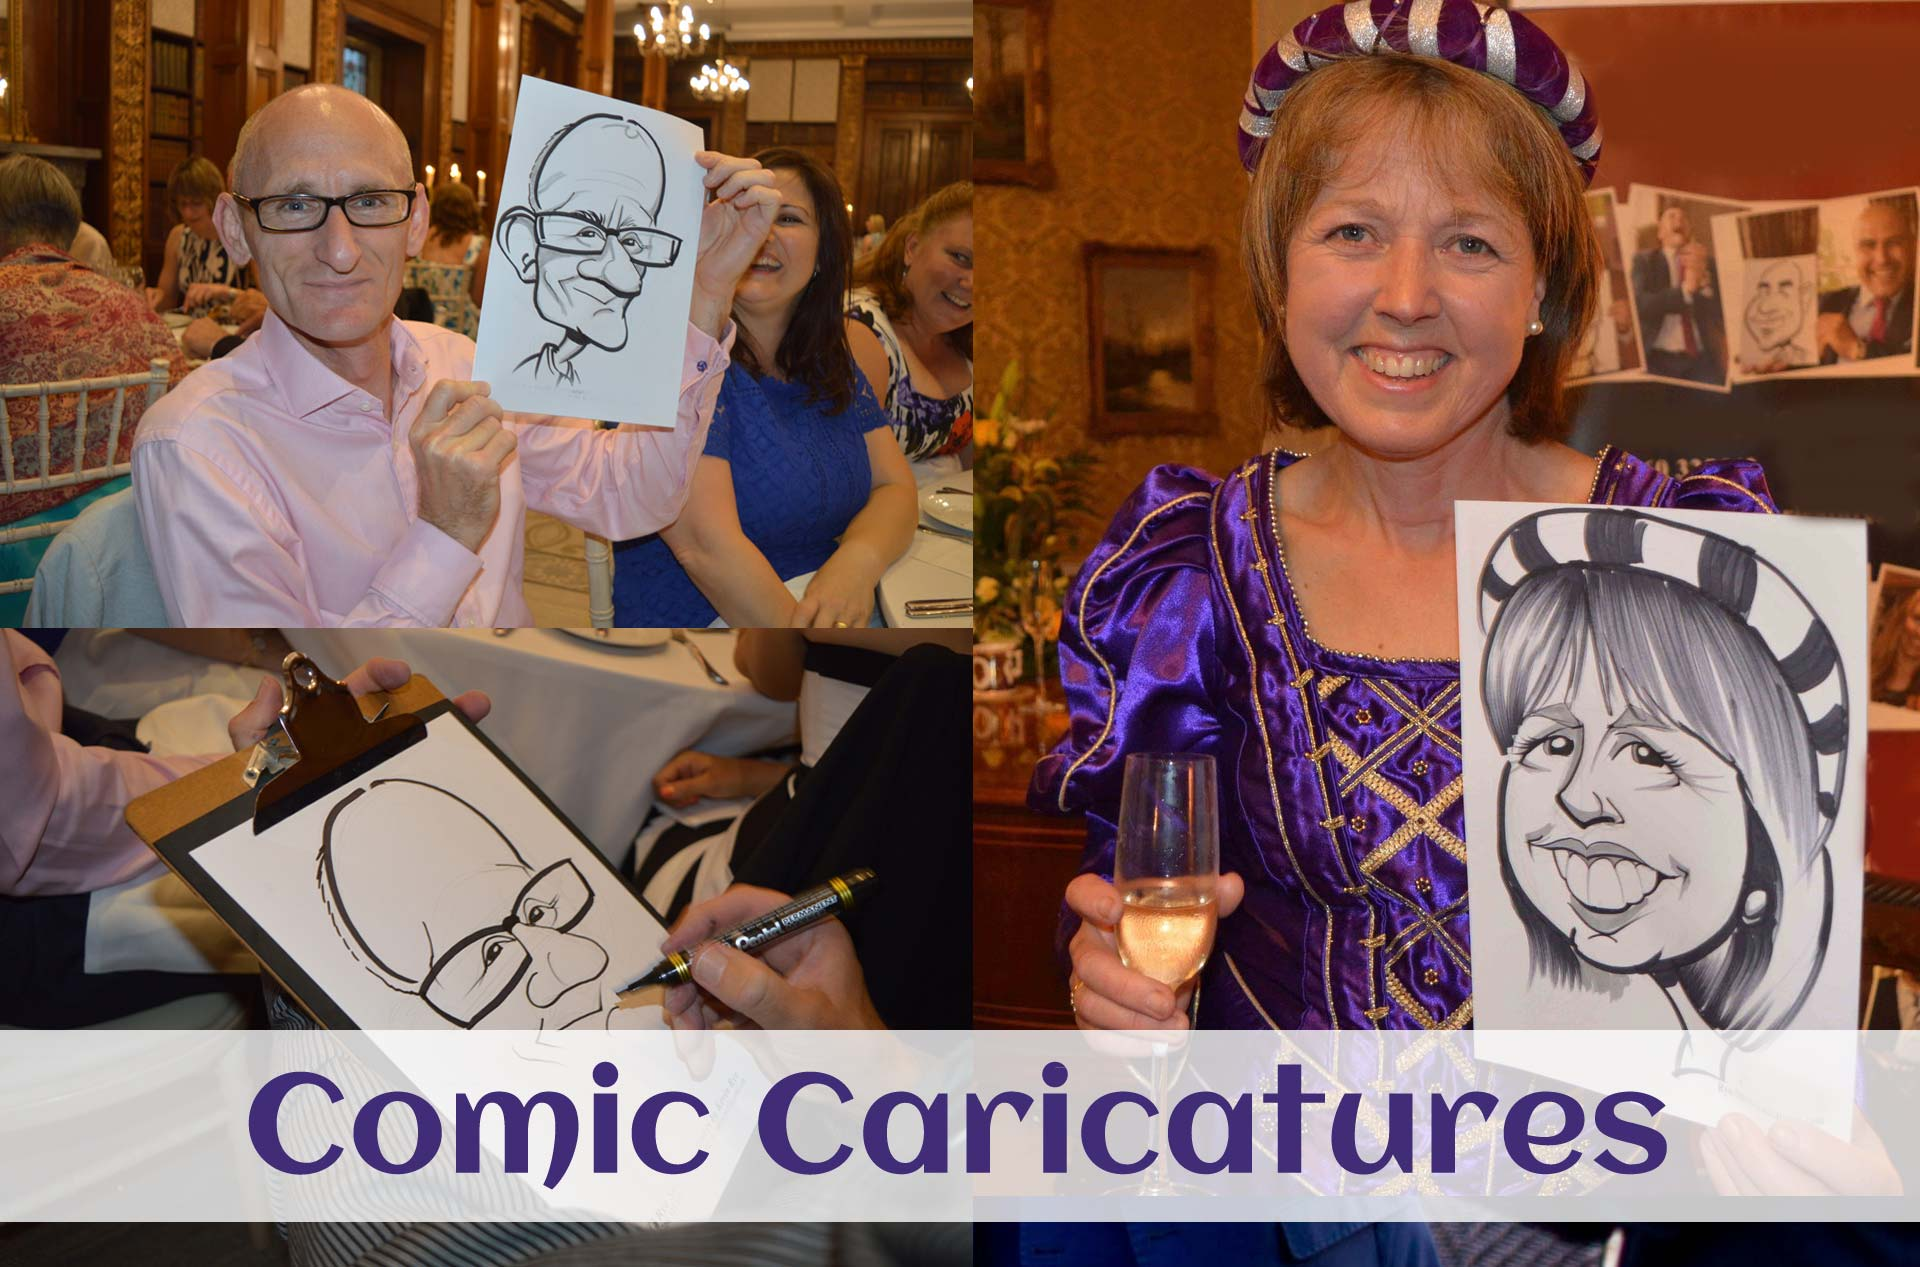 Comic Caricatres